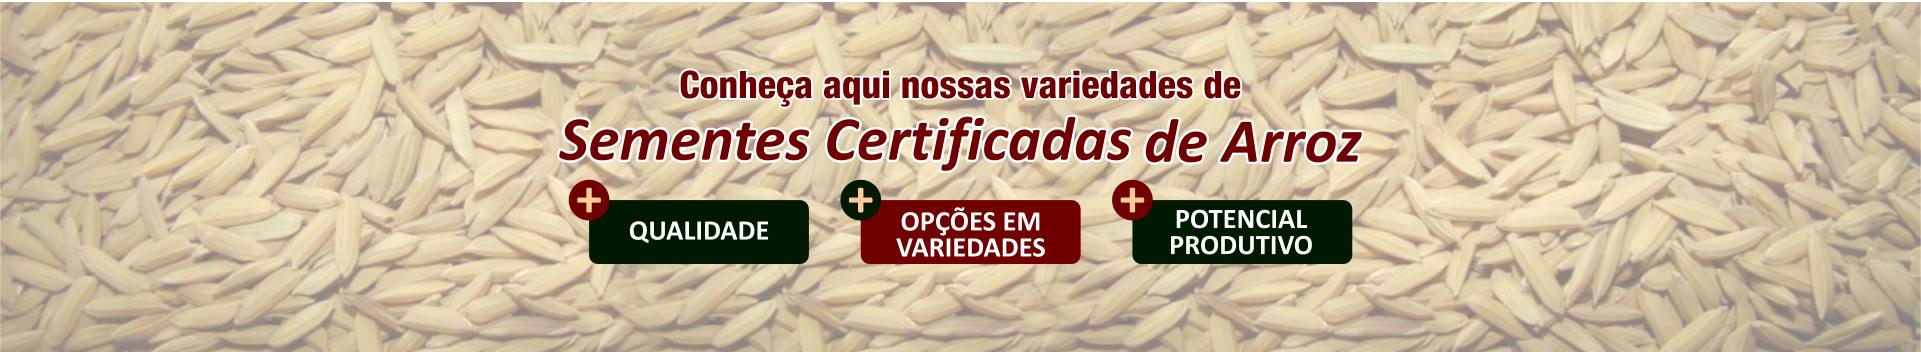 thedyagro_25_anos_sementes_certificadas_1920x350